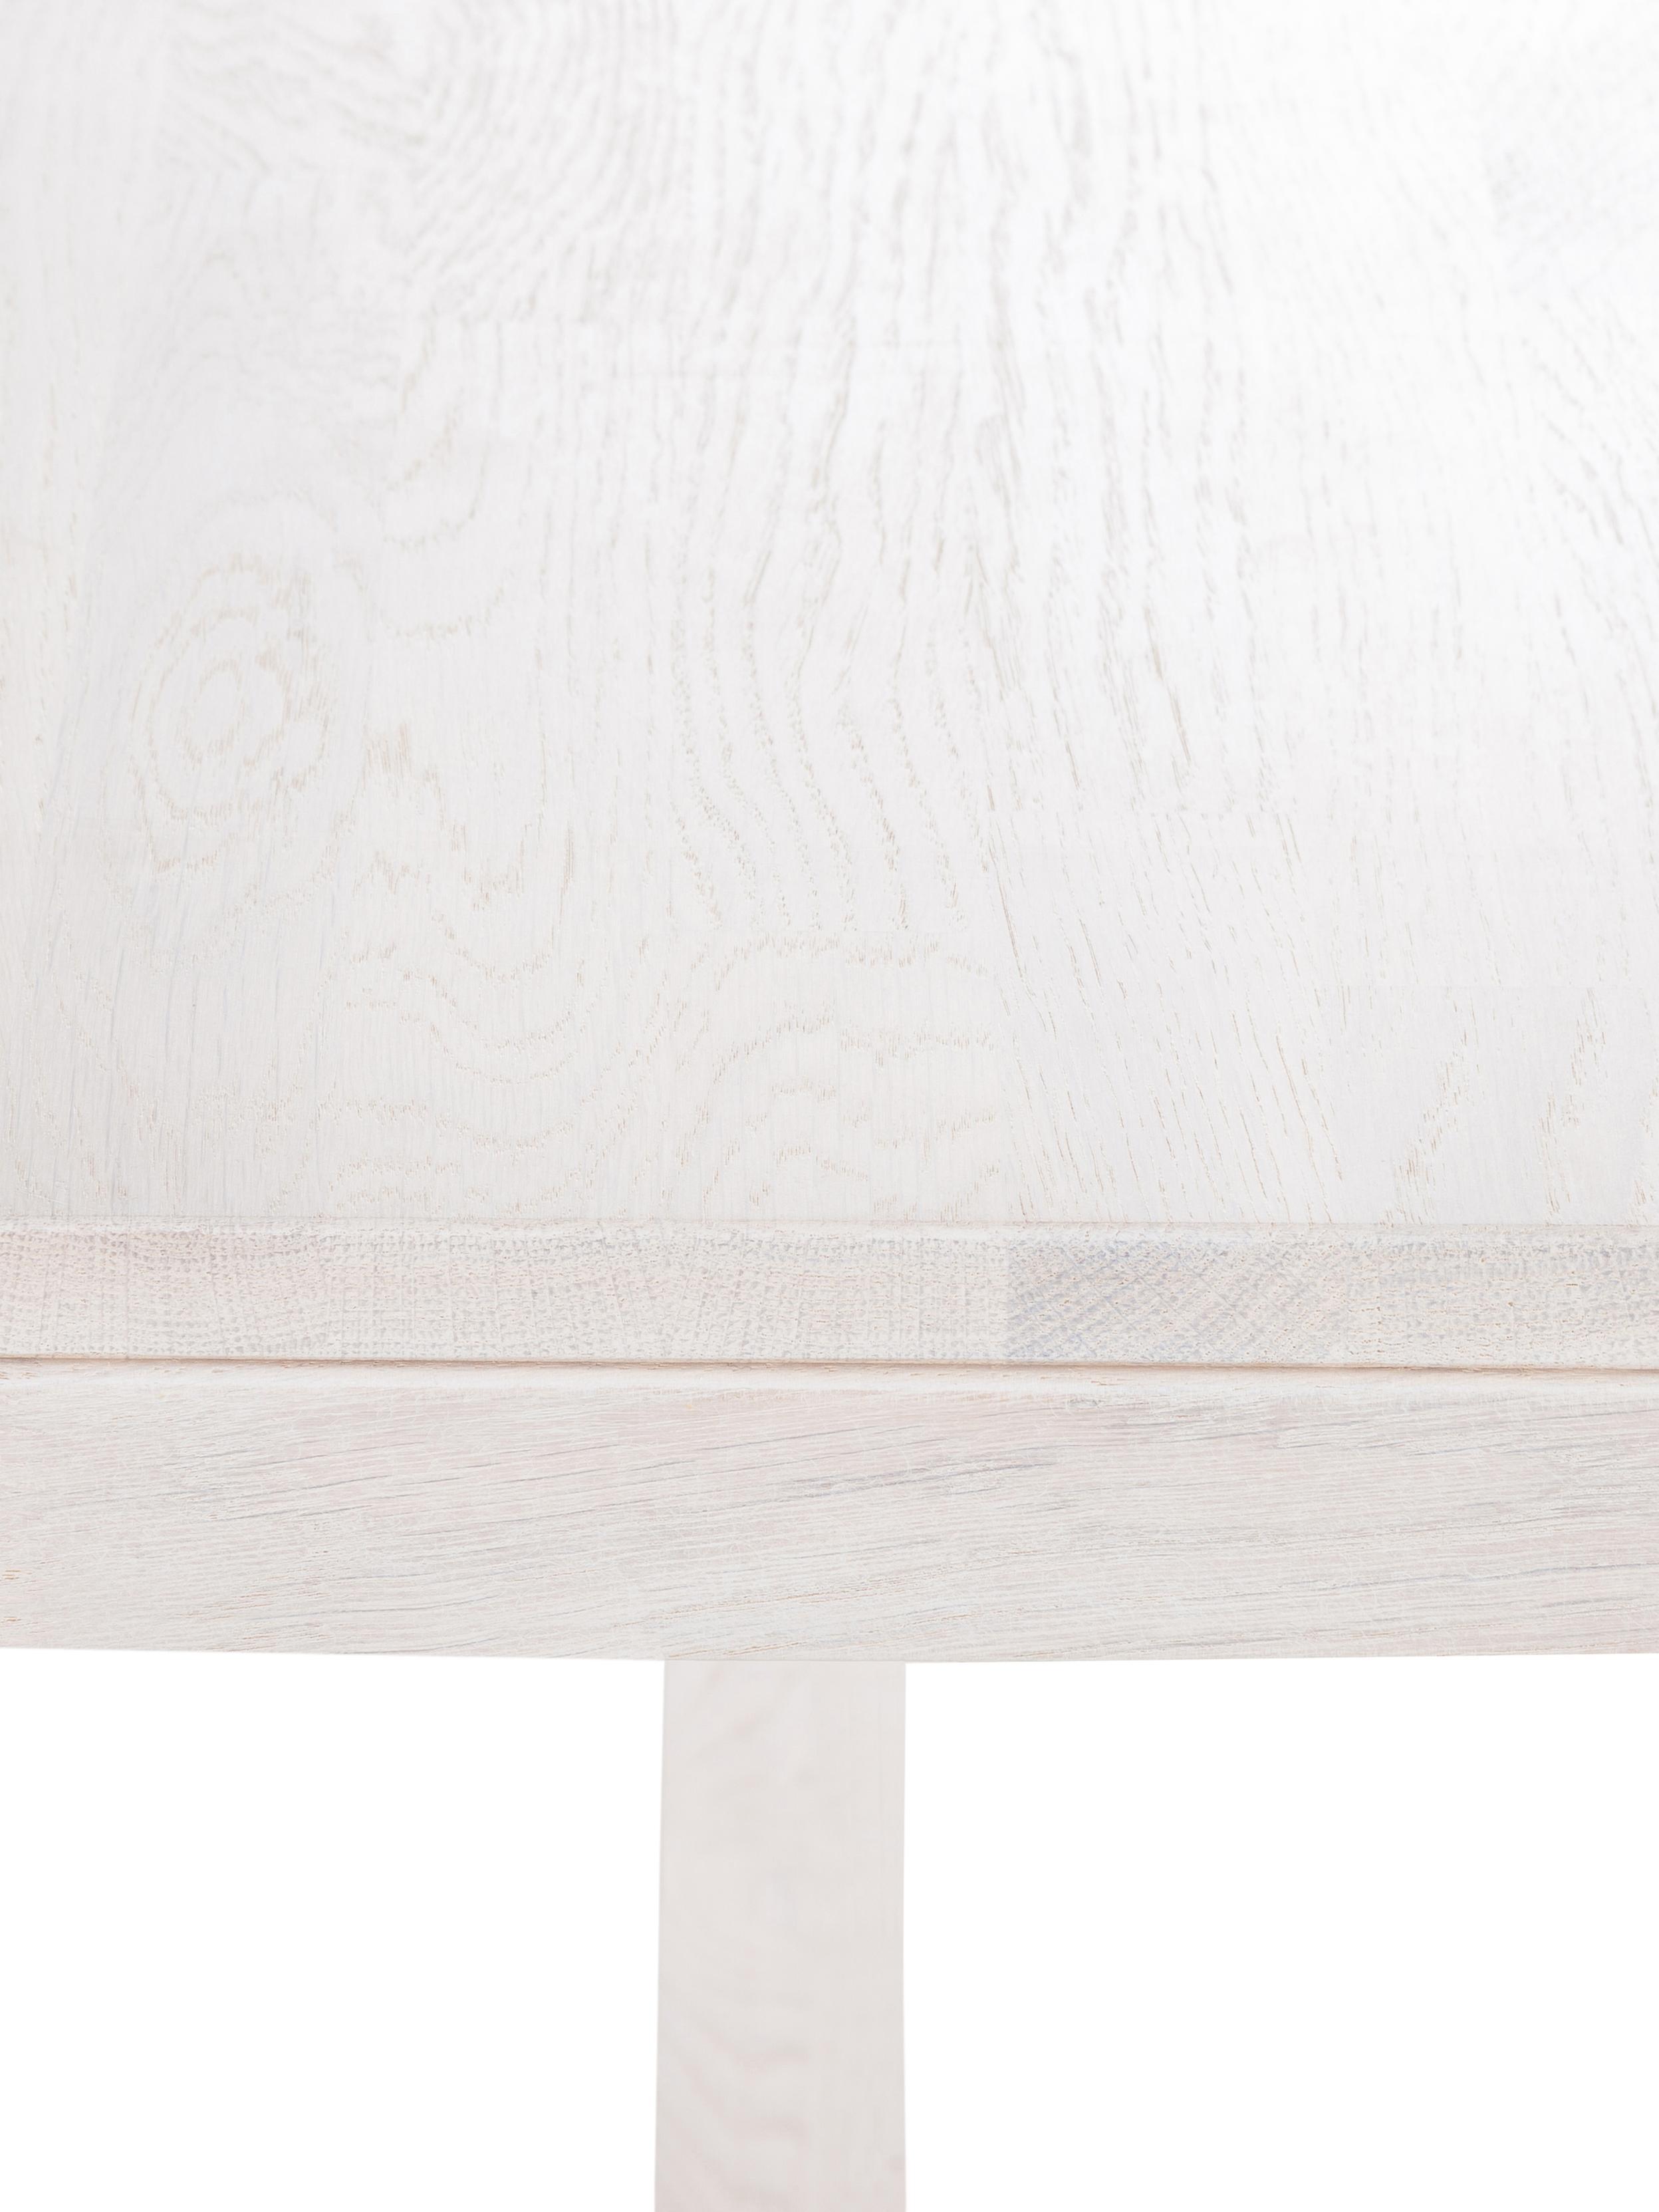 Verlengbare massief houten eettafel Brooklyn uit eikenhout, Massief, wit gewassen en geolied eikenhout, Wit gewassen eikenhout, B 170 tot 220 x D 95 cm